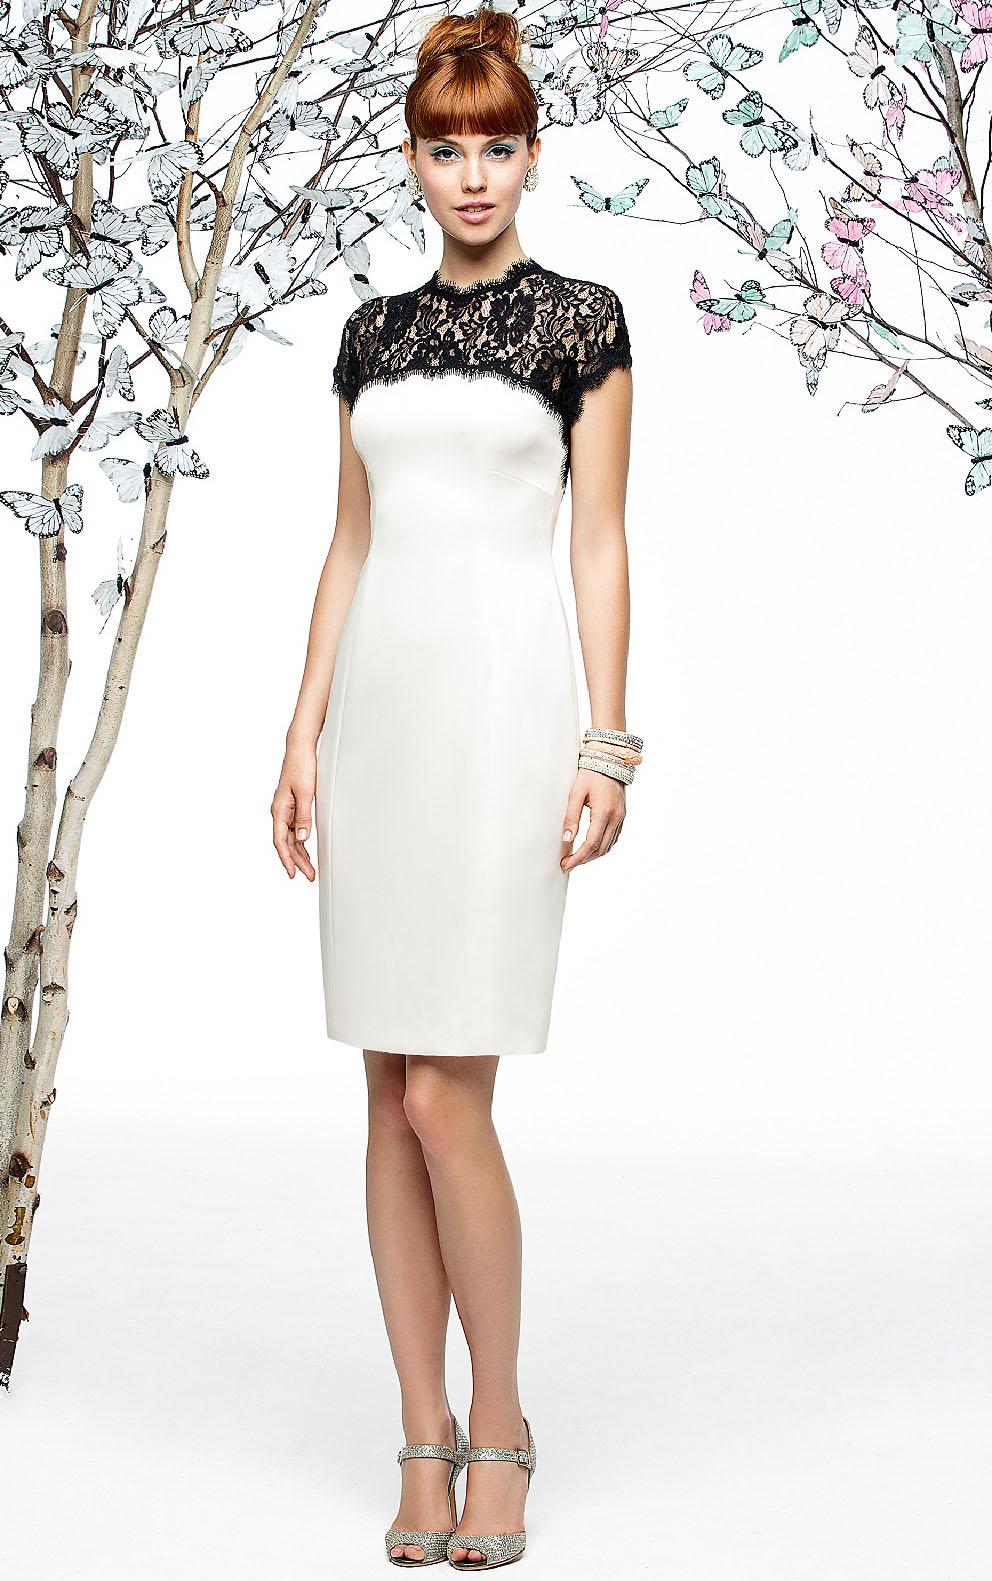 http://www.aislestyle.co.uk/zipper-jewel-cap-sleeves-empire-short-bridesmaid-dresses-p-5142.html